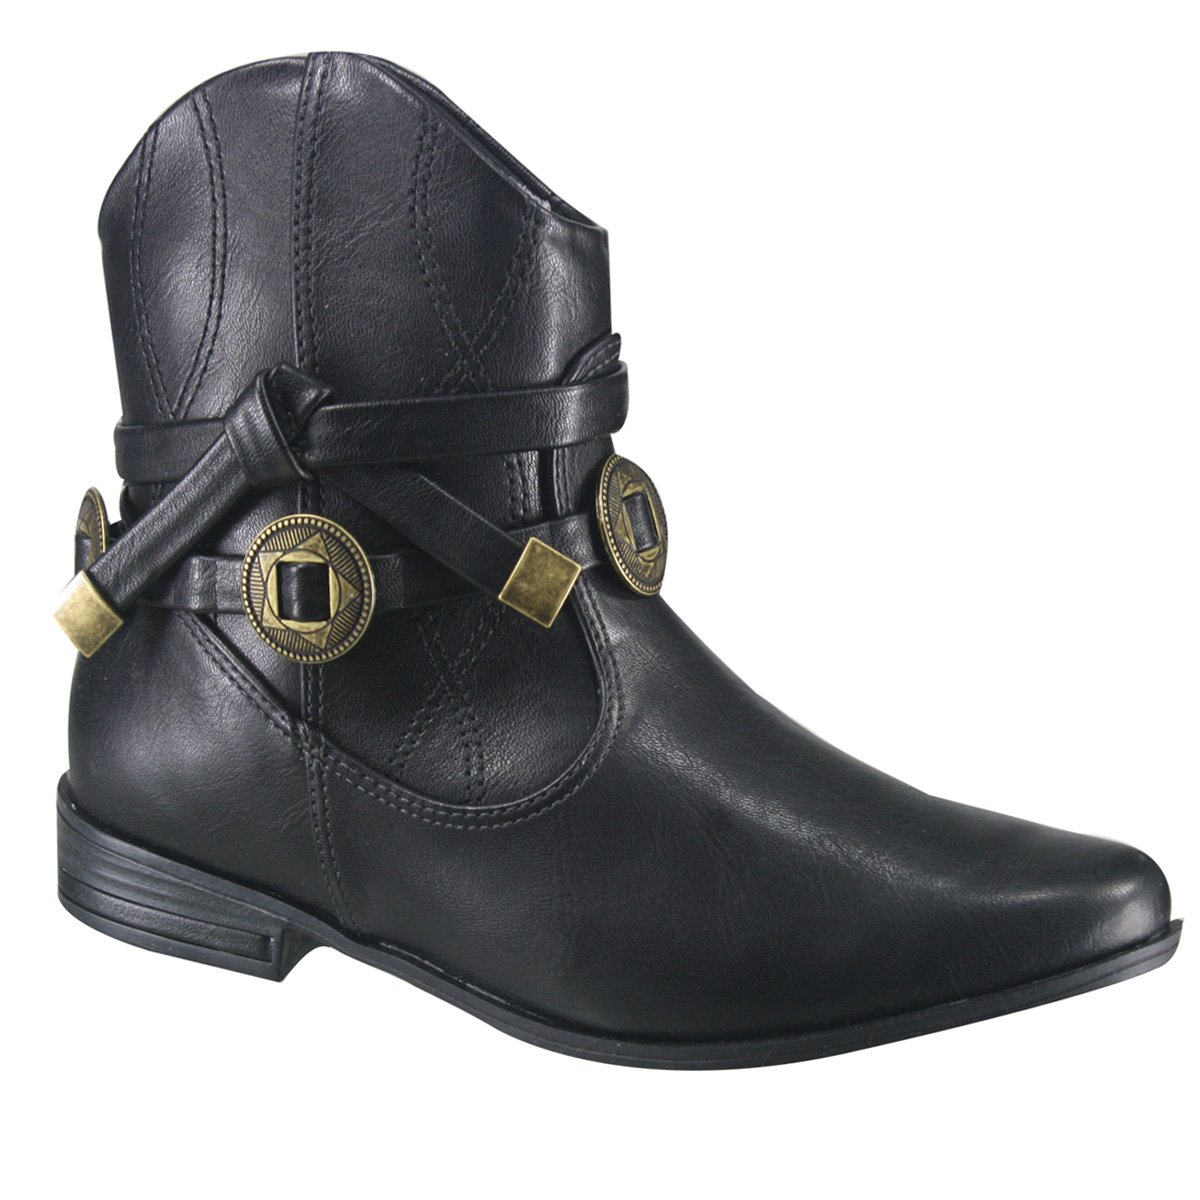 ccdee0d4d Bota Ankle Boot Ramarim 17-60102 000009 - Preto (Naturale Plus ...